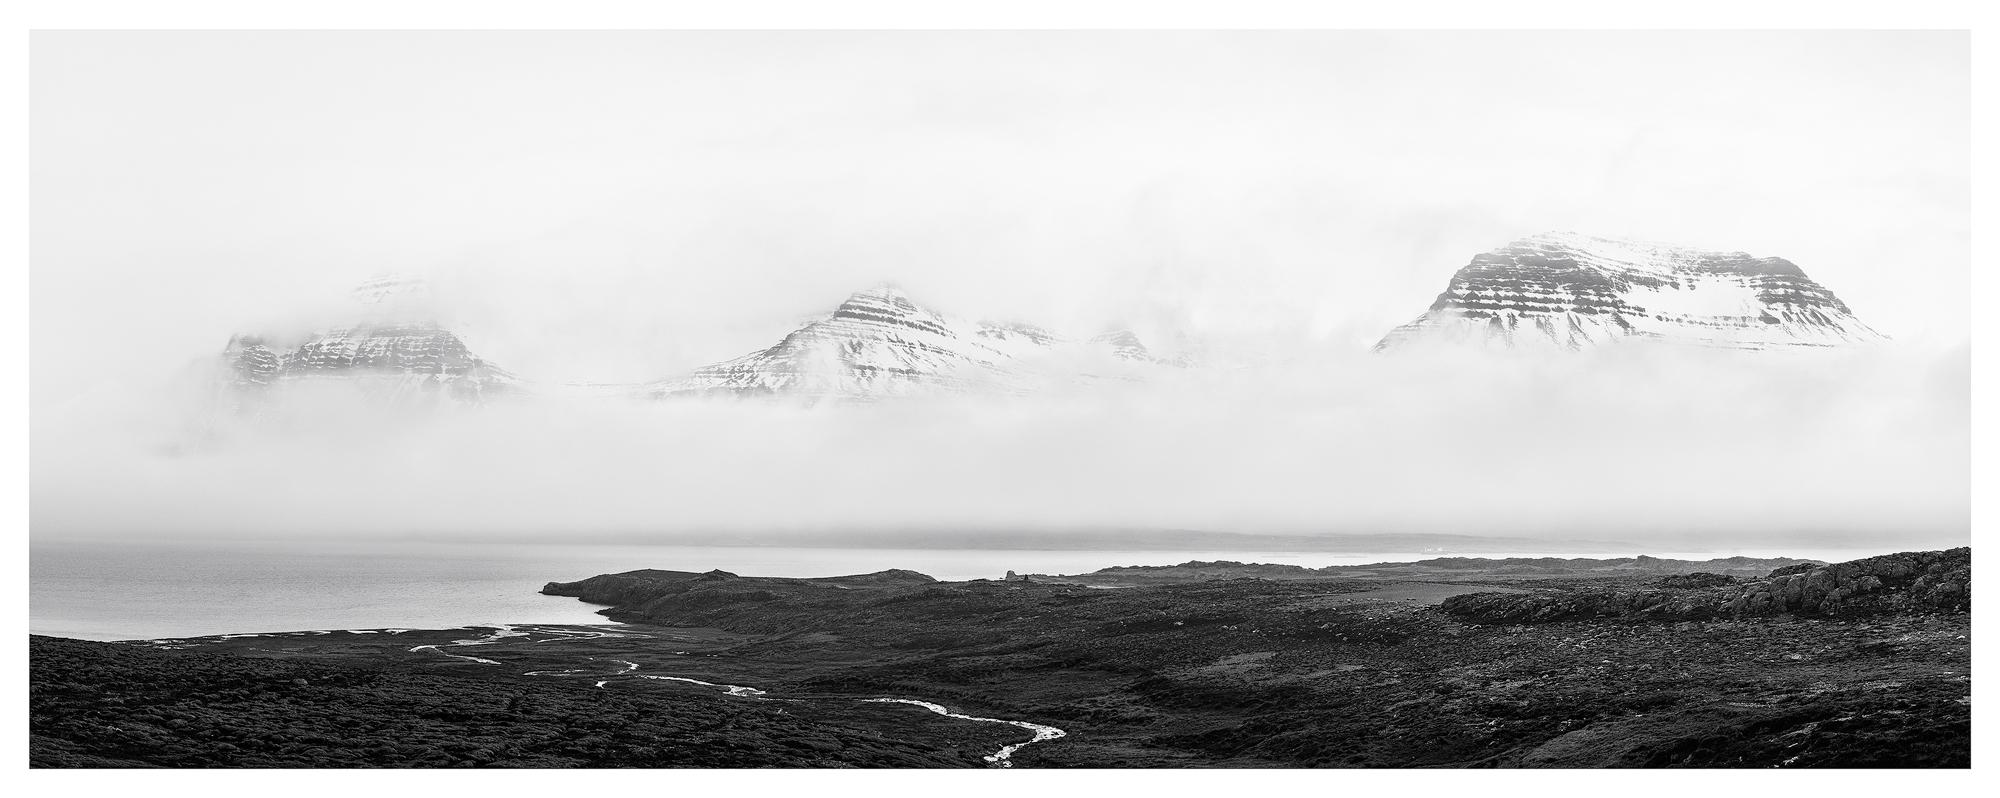 East-Fjords_BW_Pano-copy.jpg